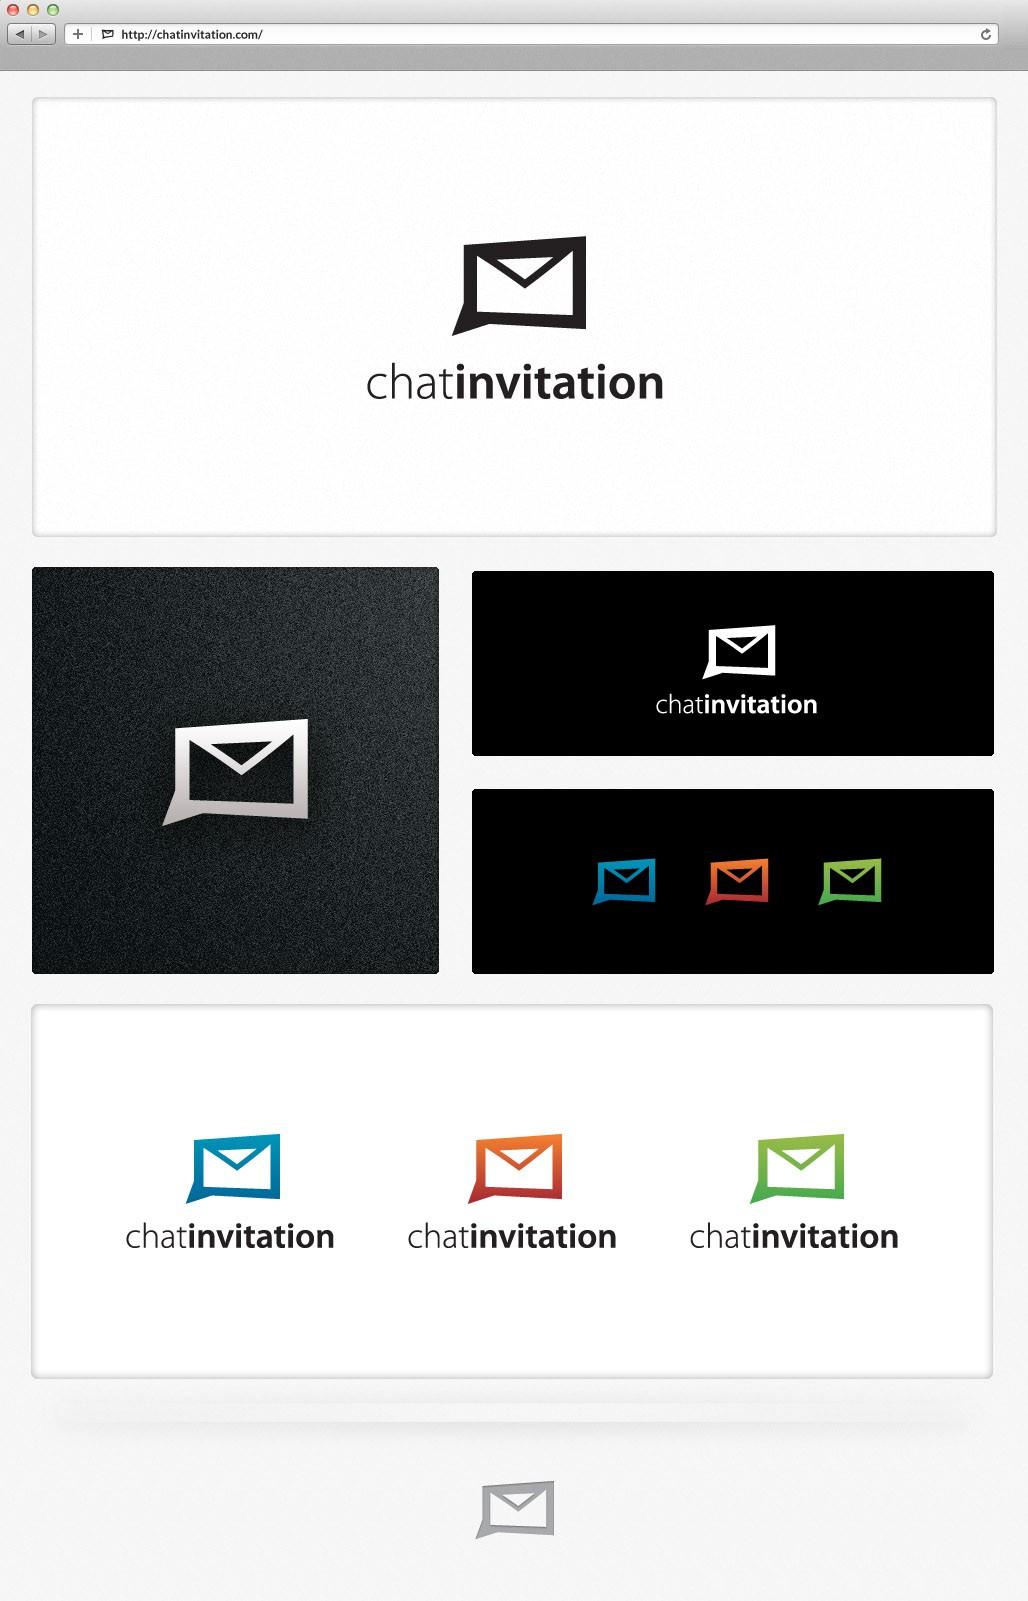 Create the next logo for chatinvitation.com